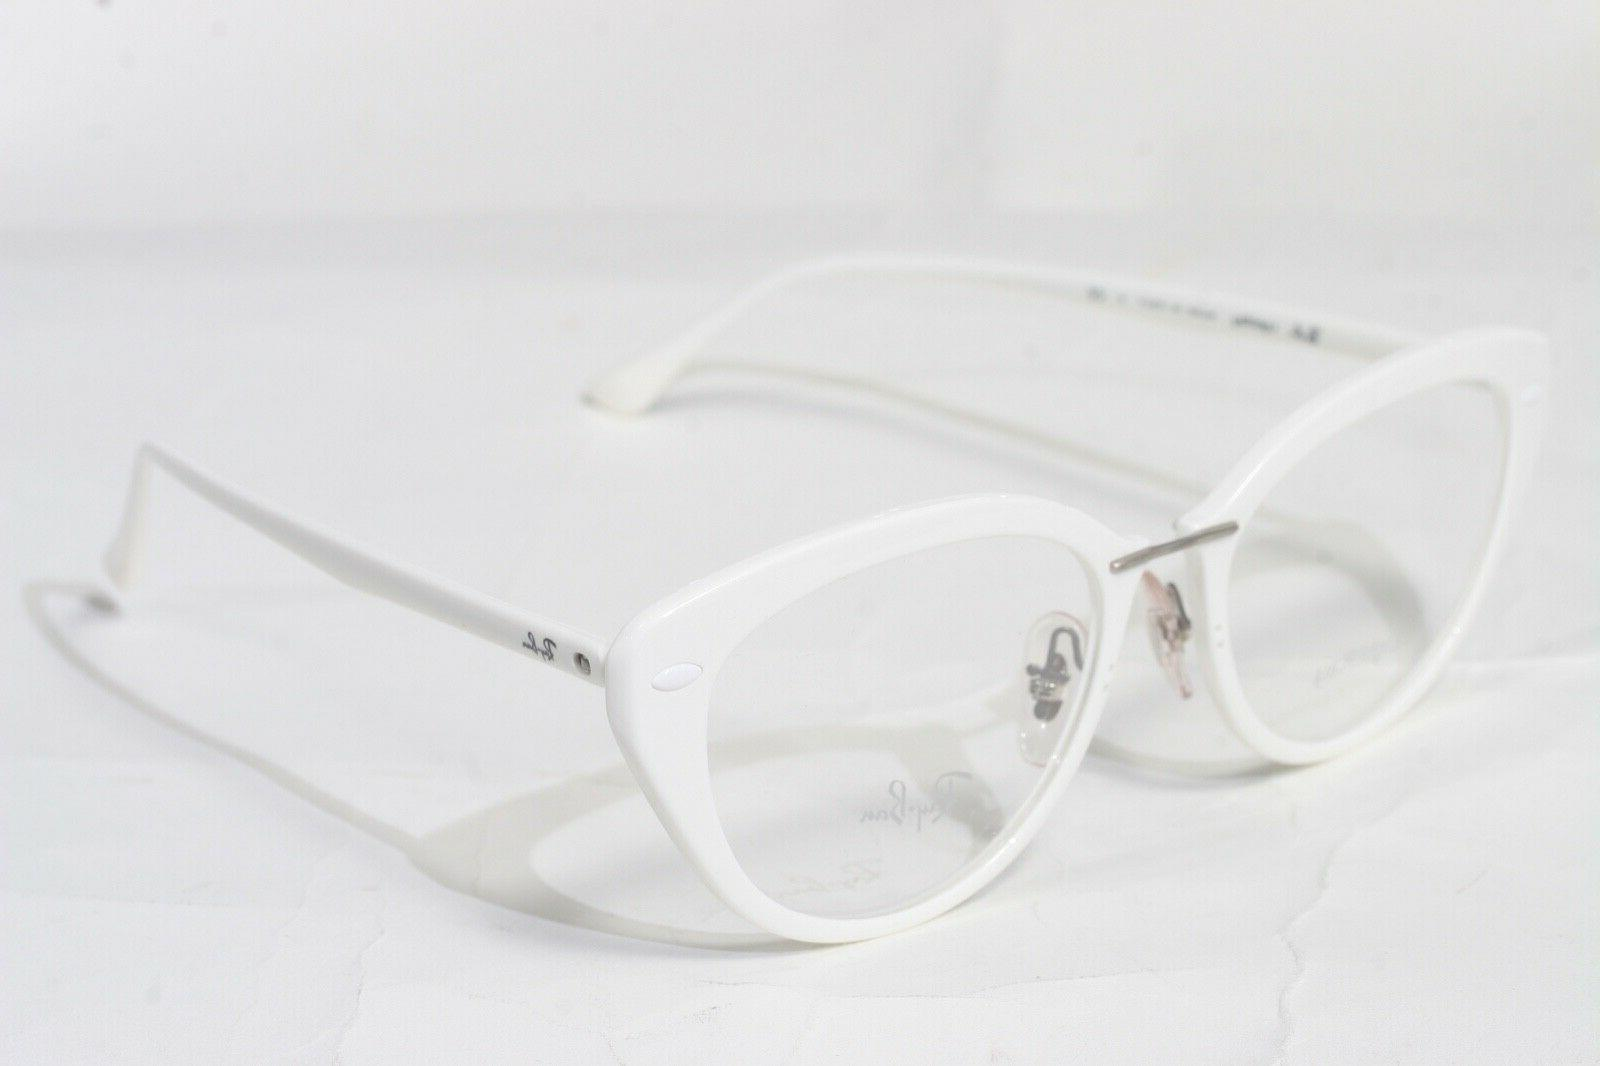 New Authentic Ray Ban Cat Eye RX Eyeglasses 7088 5618 Gloss